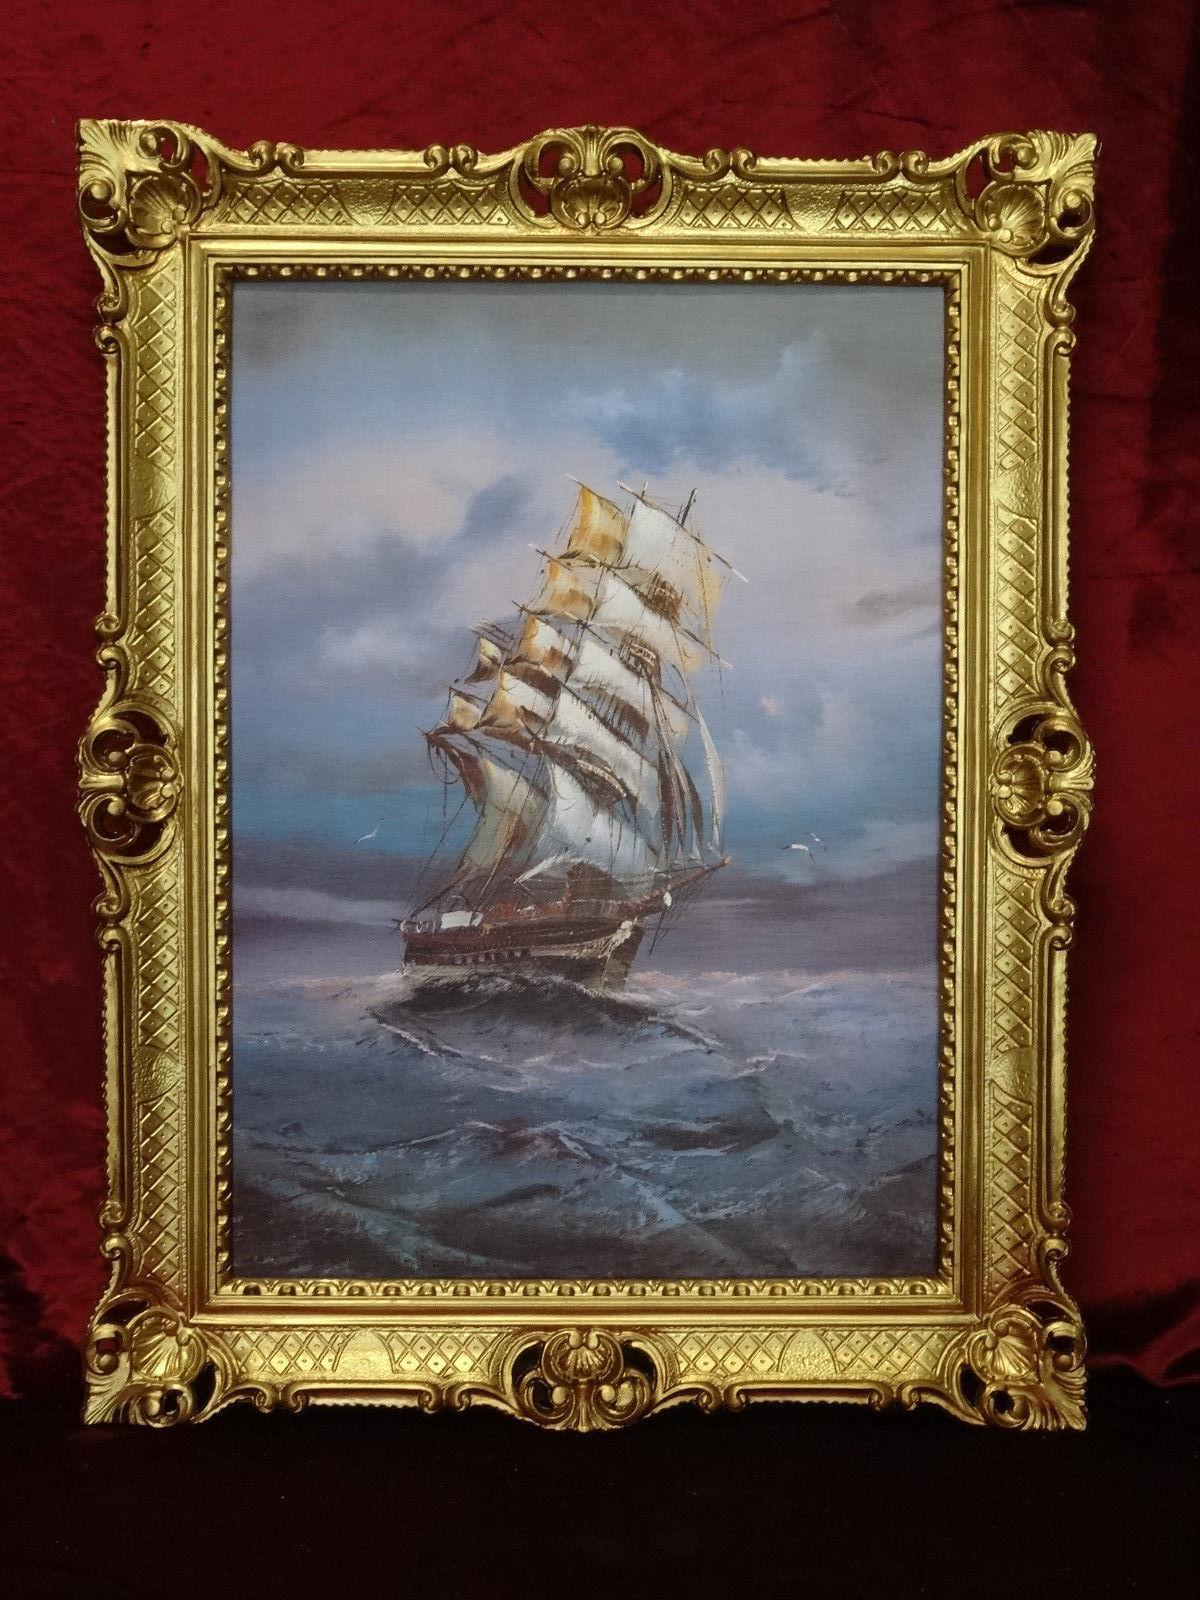 gem lde segelschiff meer schiffsbilder seest ck maritime 90x70 seefahrt im sturm kaufen bei. Black Bedroom Furniture Sets. Home Design Ideas